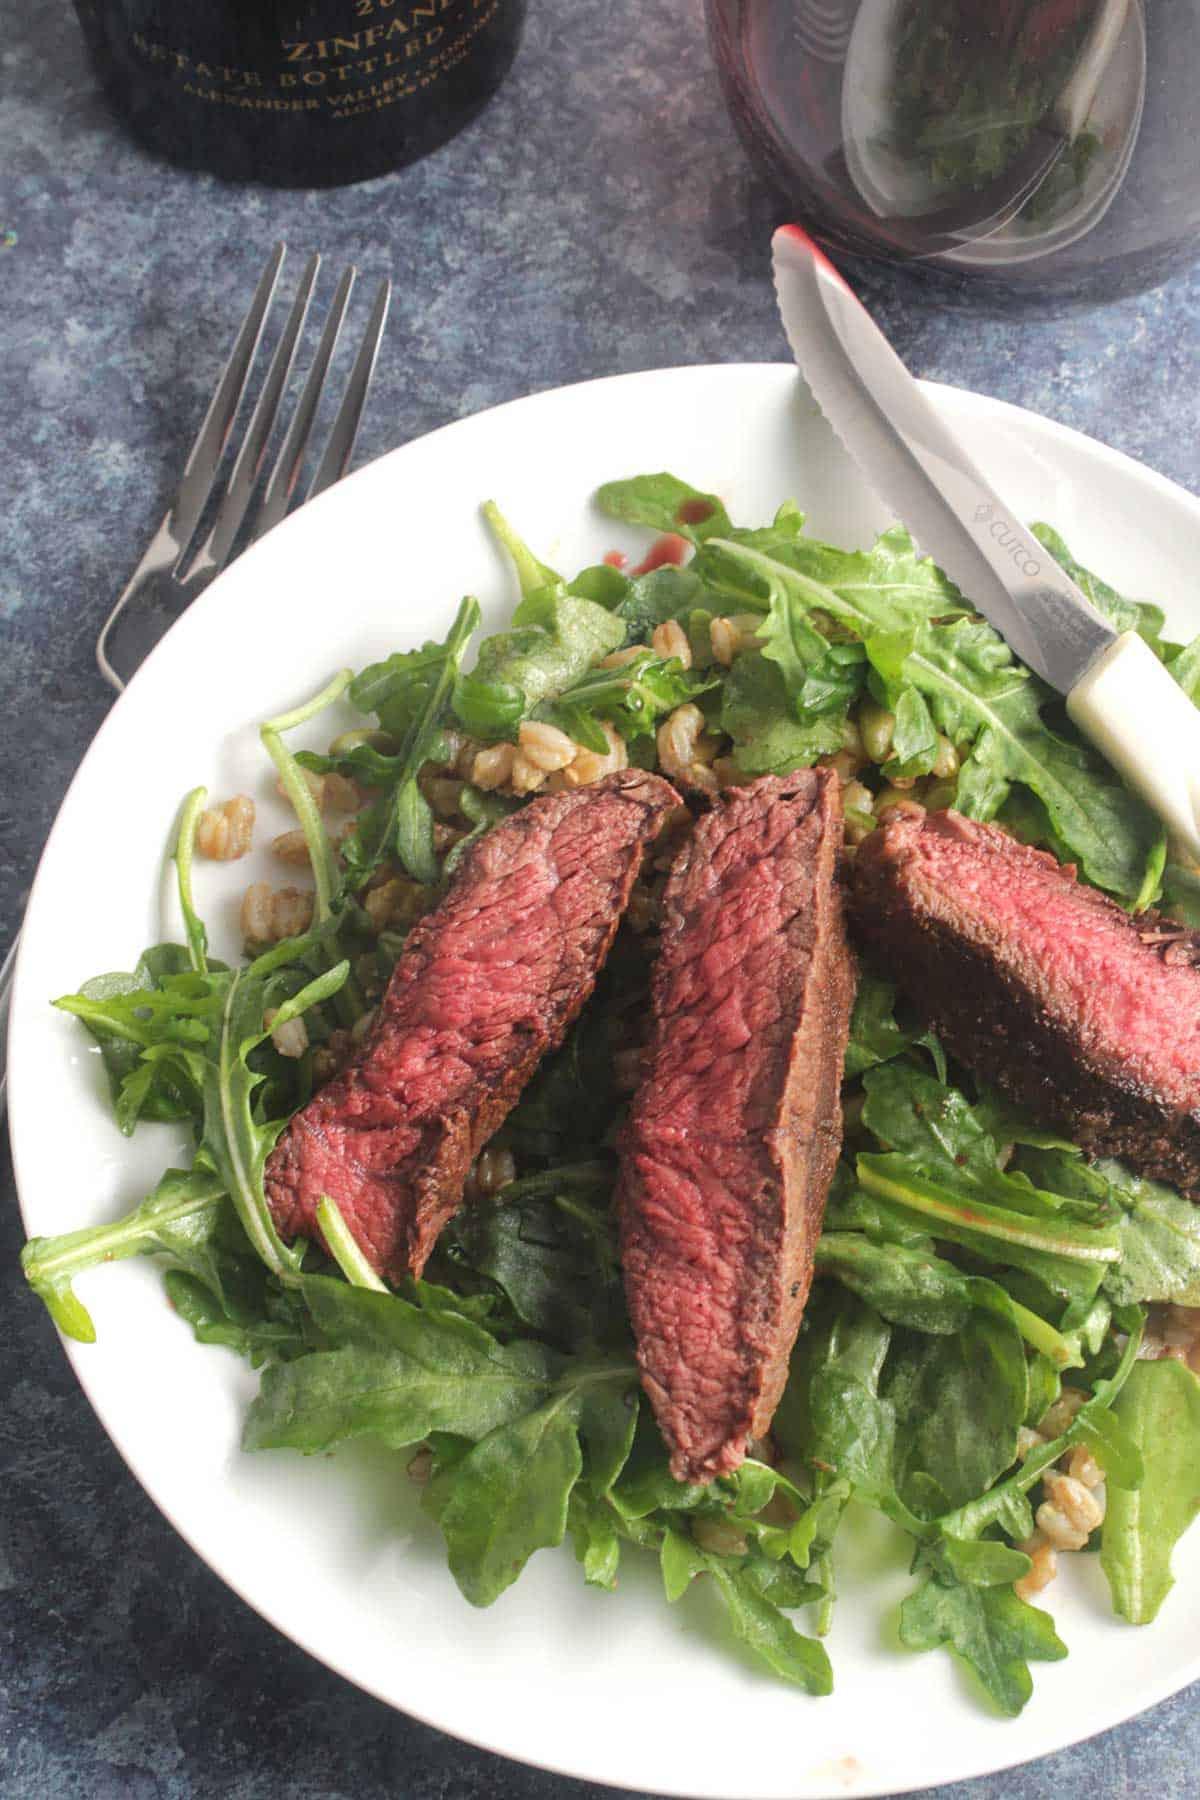 arugula and steak salad on a white dish.